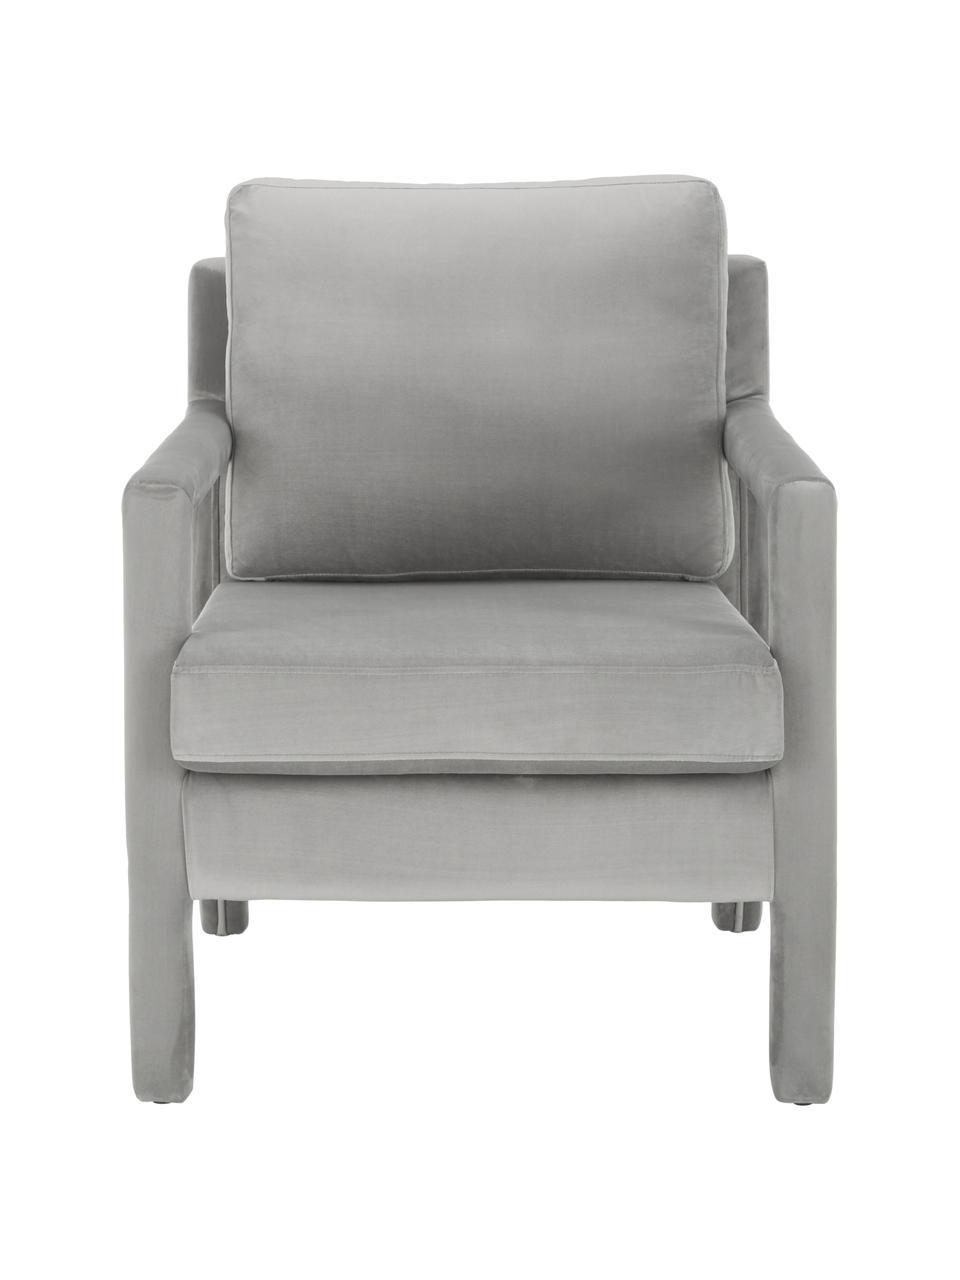 Samt-Sessel Claudette in Grau, Bezug: Samt (100% Polyester) Der, Gestell: Massives Kiefernholz, Spe, Grau, B 65 x T 75 cm